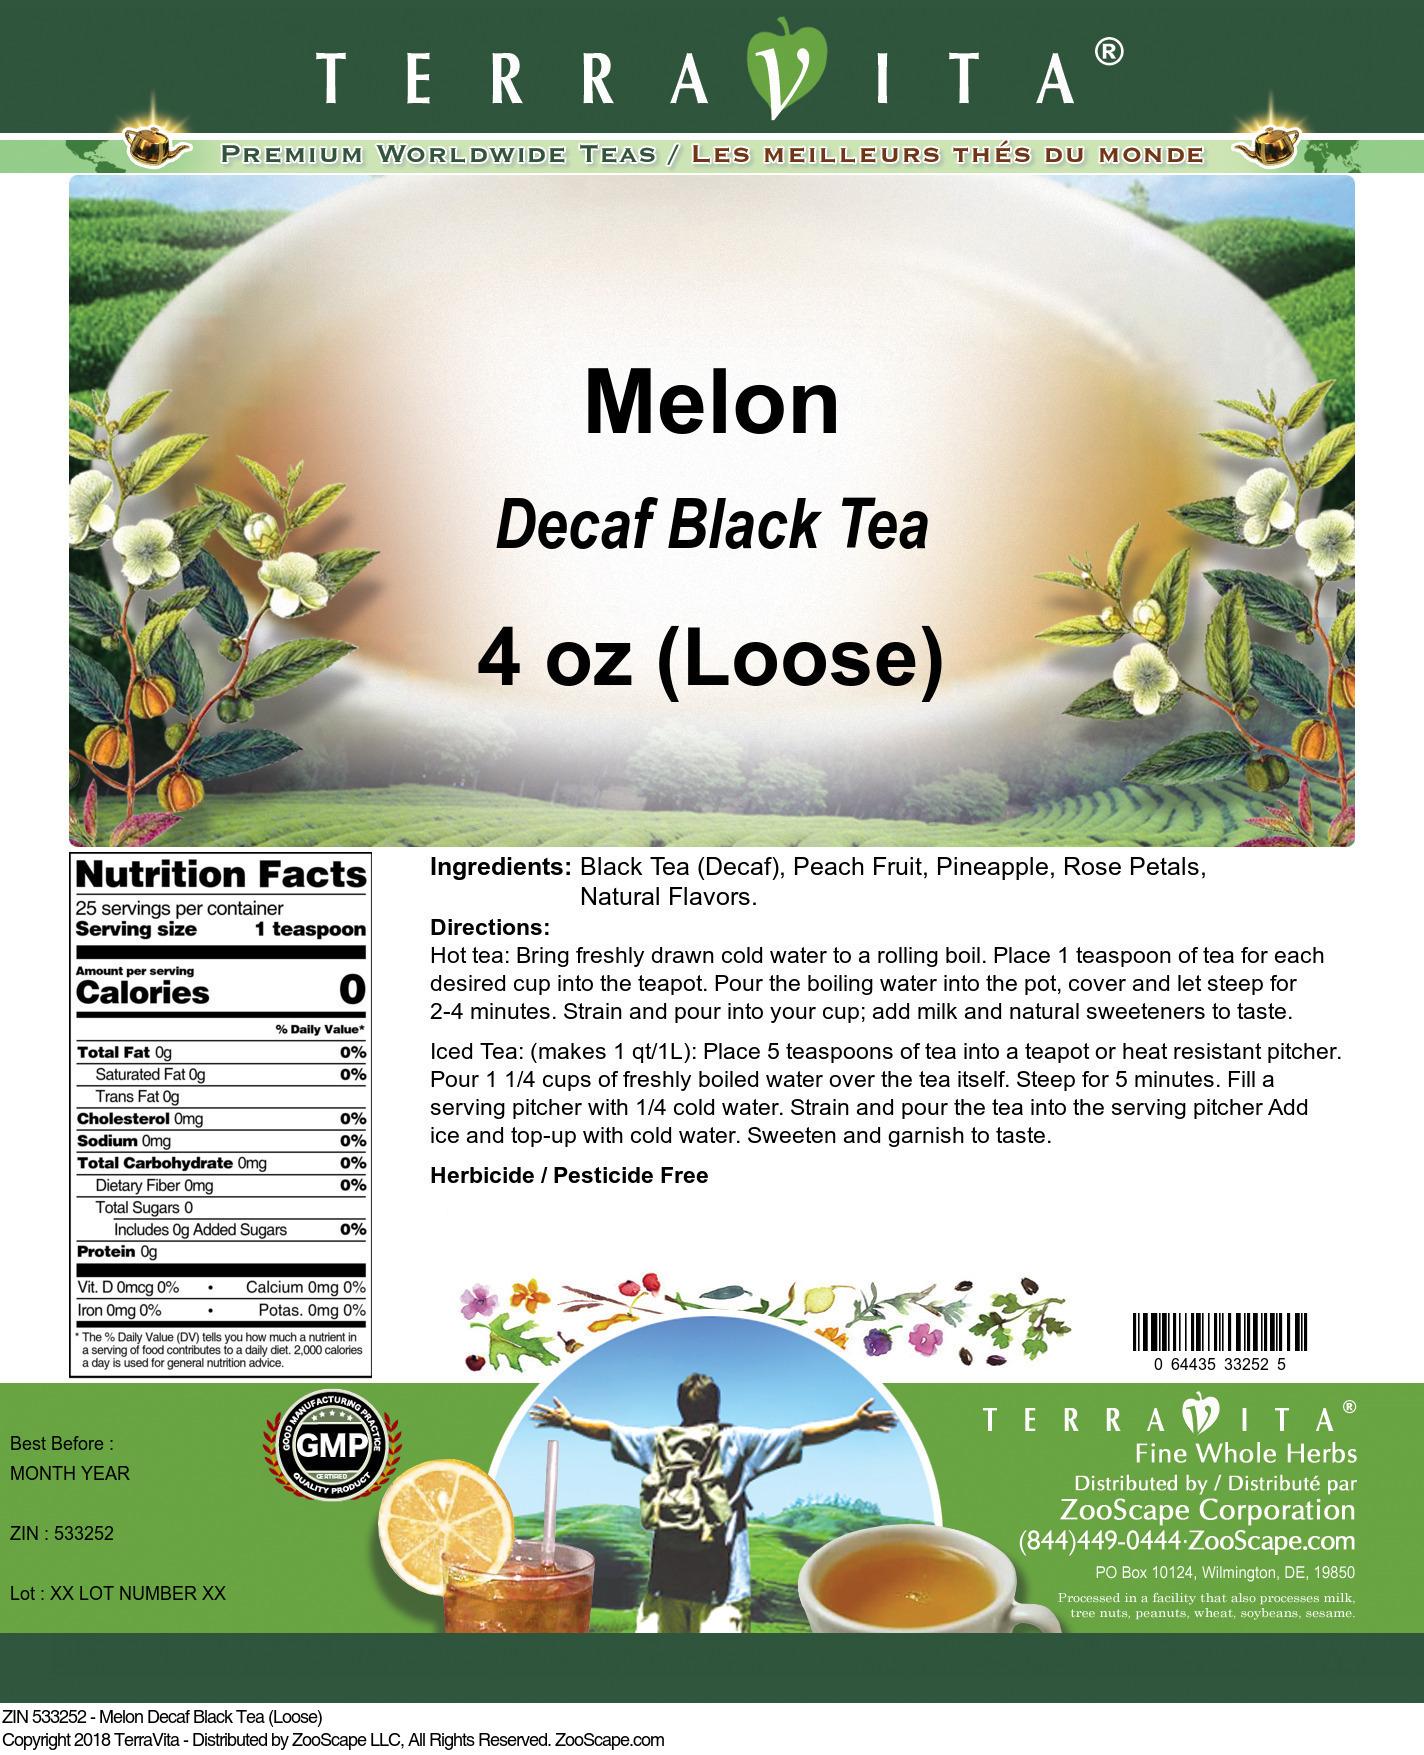 Melon Decaf Black Tea (Loose)